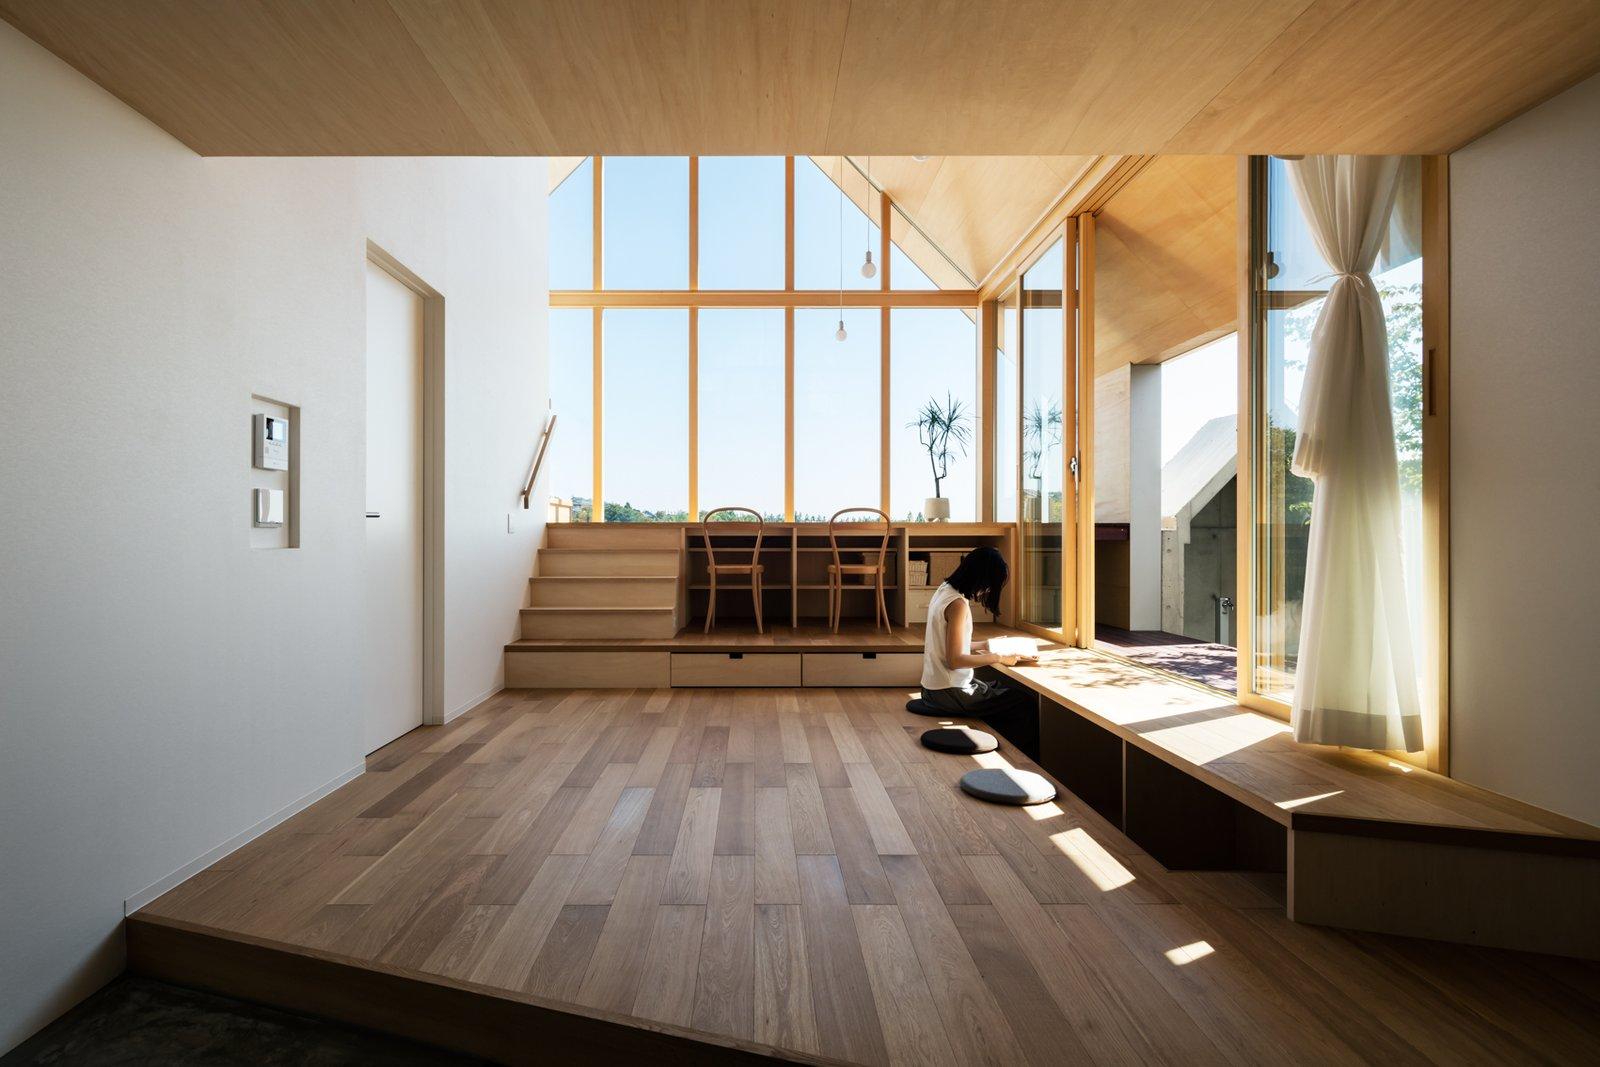 Living Room, Chair, and Medium Hardwood Floor  Newtown House